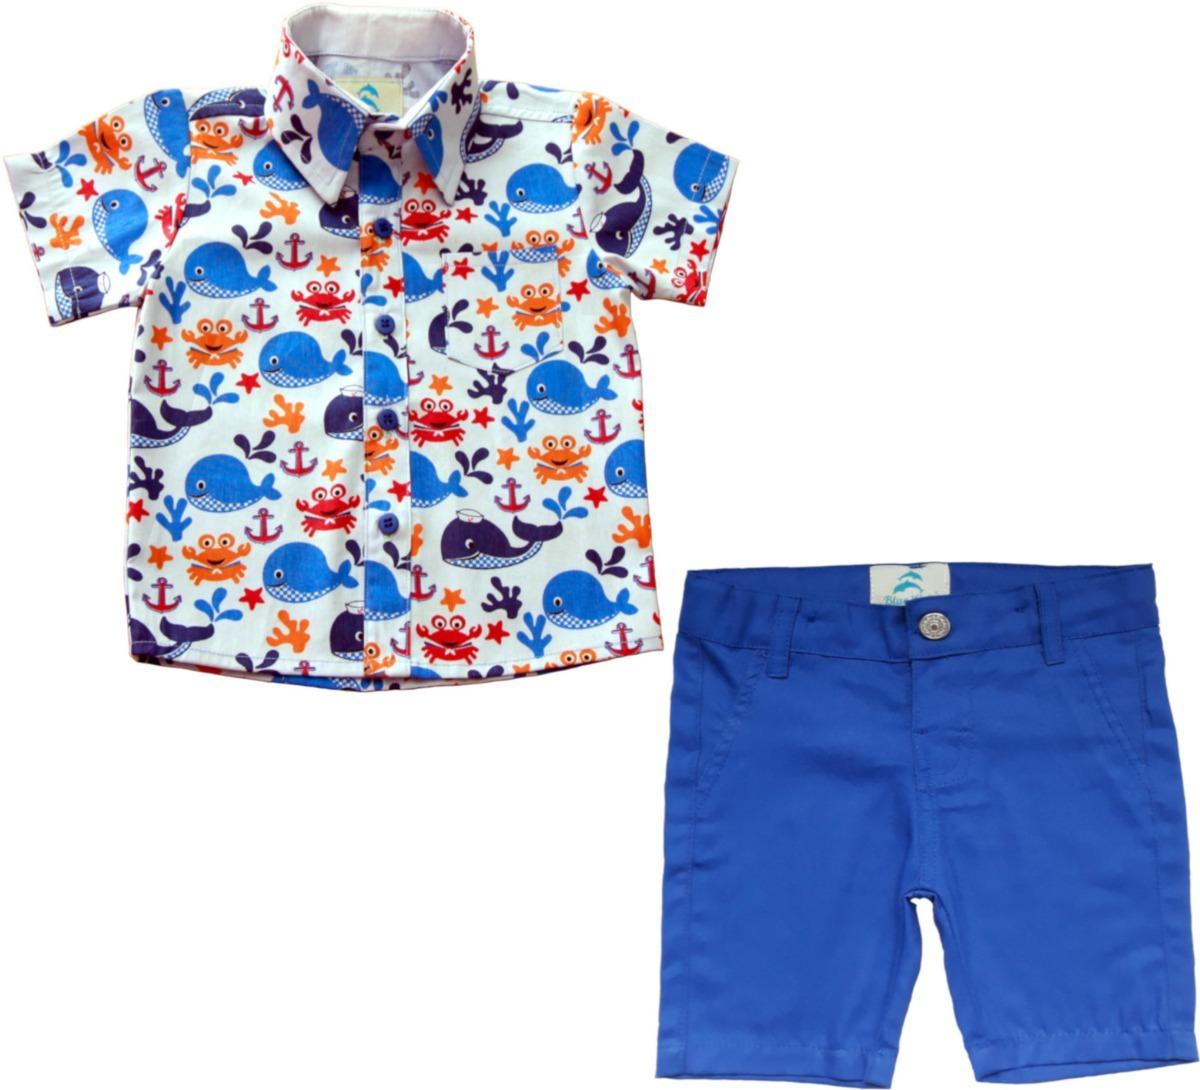 da7a5daefe Conjuntinho Camisa Manga Curta Infantil Menino E Bermuda - R  145